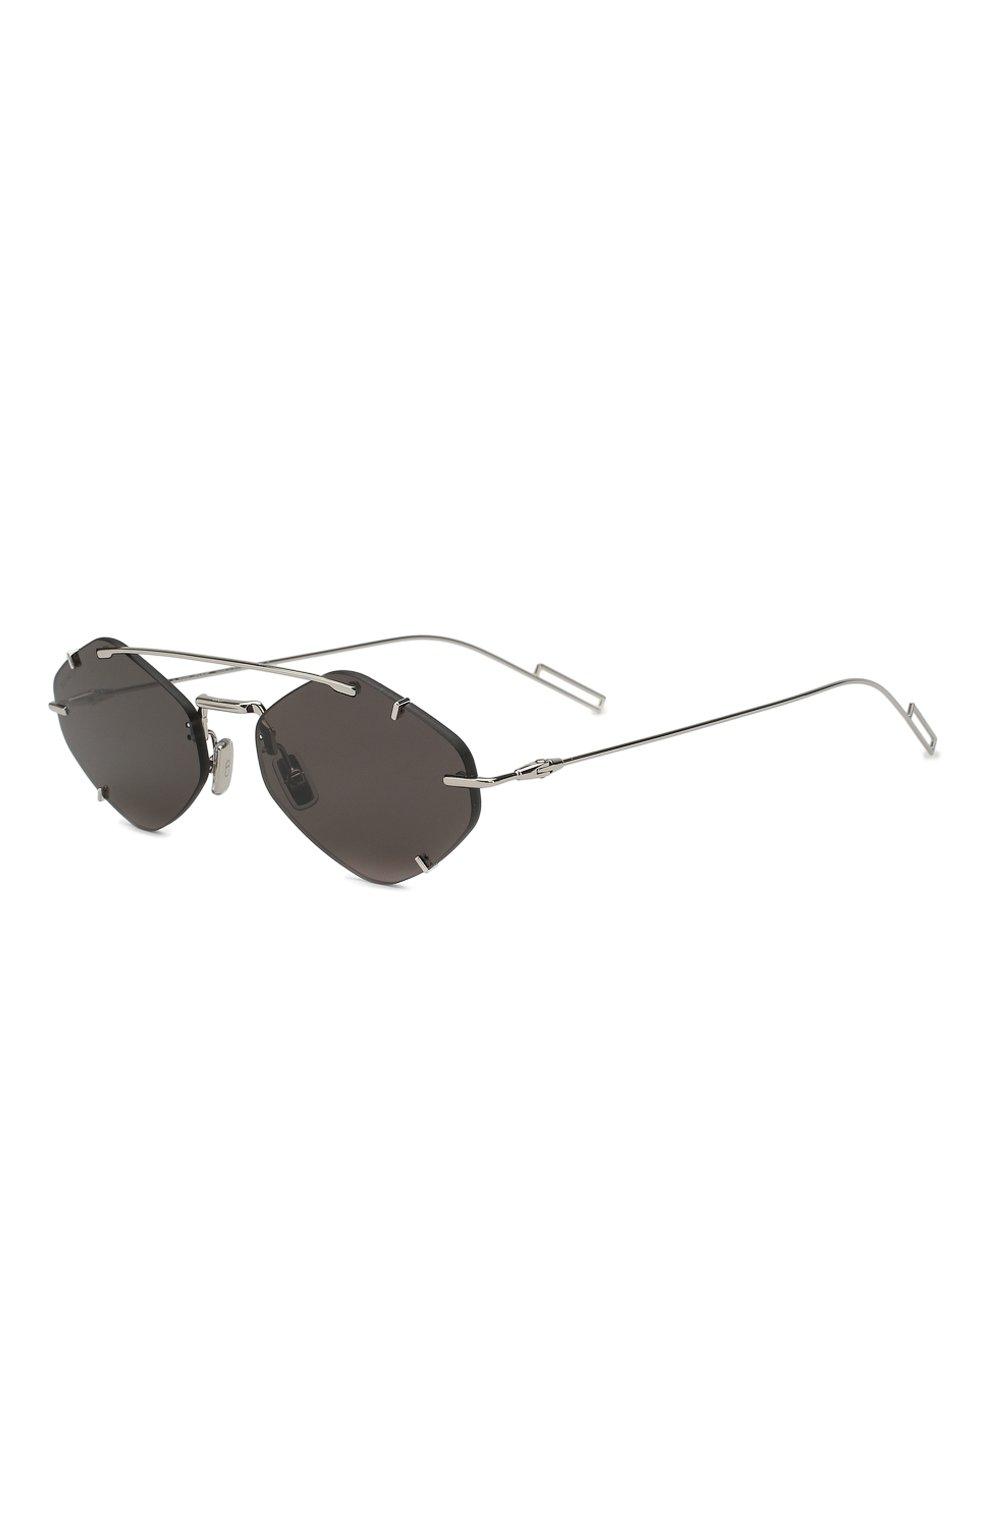 Женские солнцезащитные очки DIOR темно-серого цвета, арт. DI0RINCLUSI0N 010 2K | Фото 1